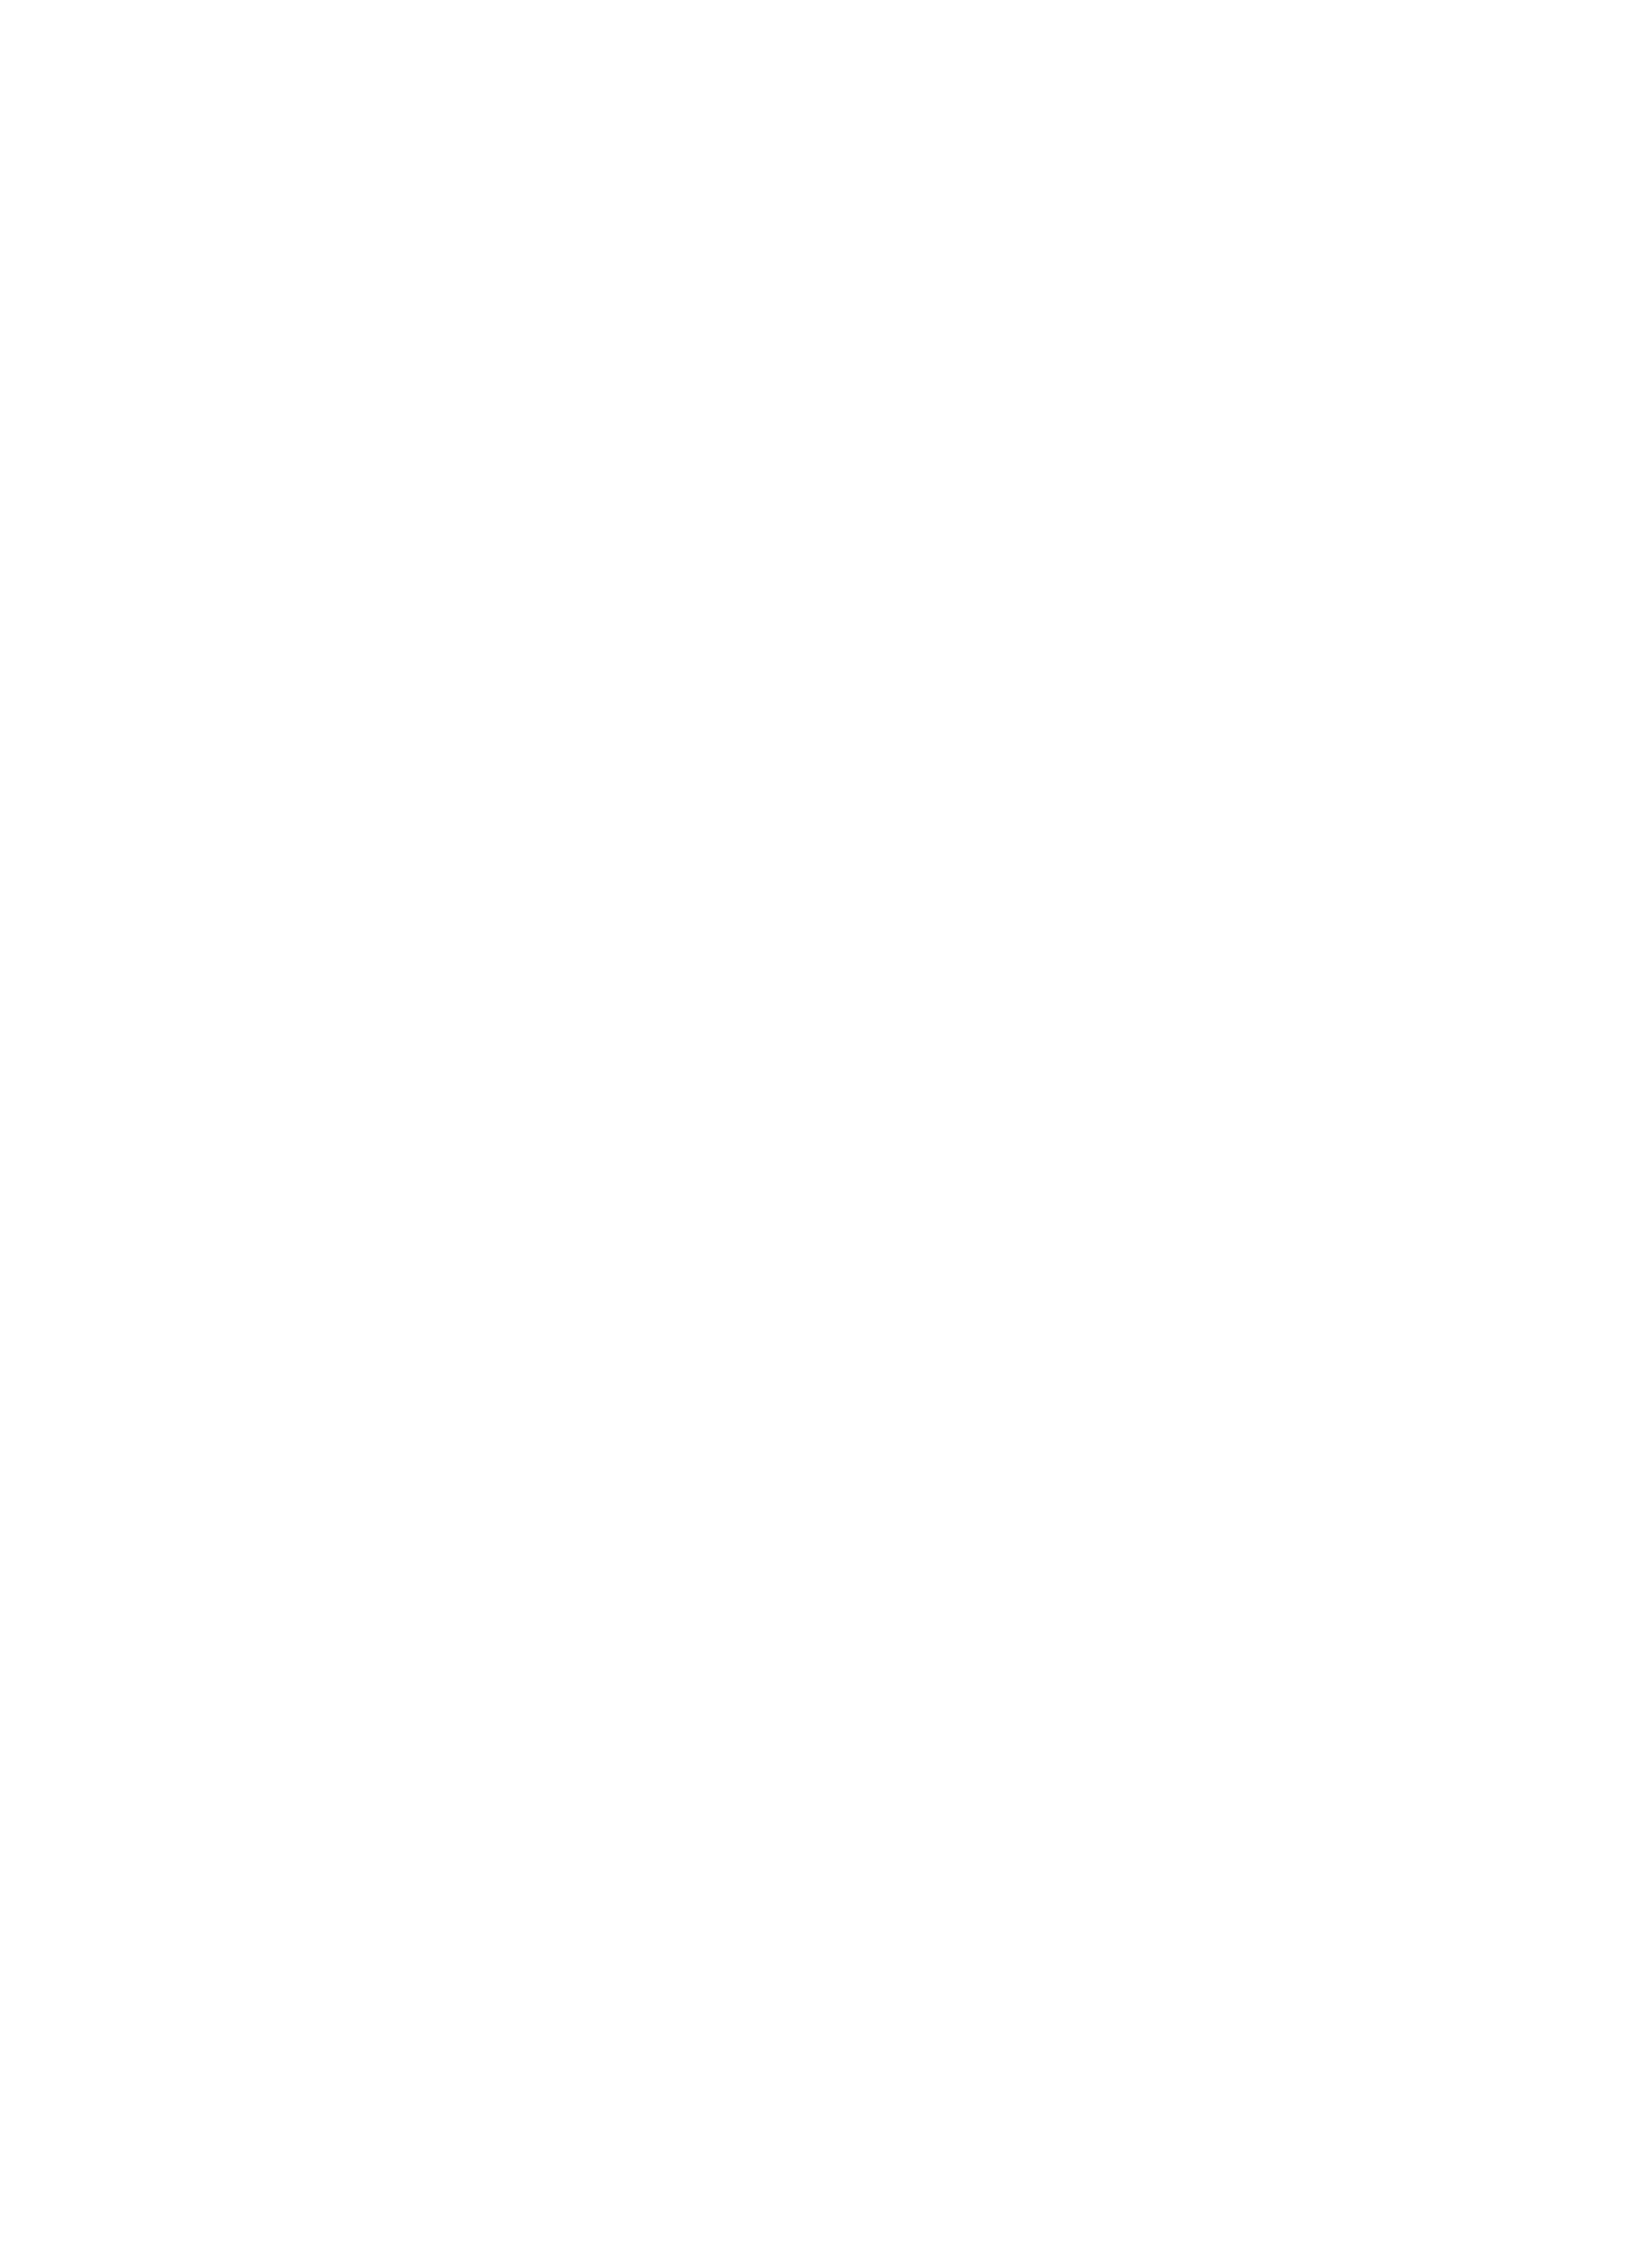 Delmonico Cut Steakhouse